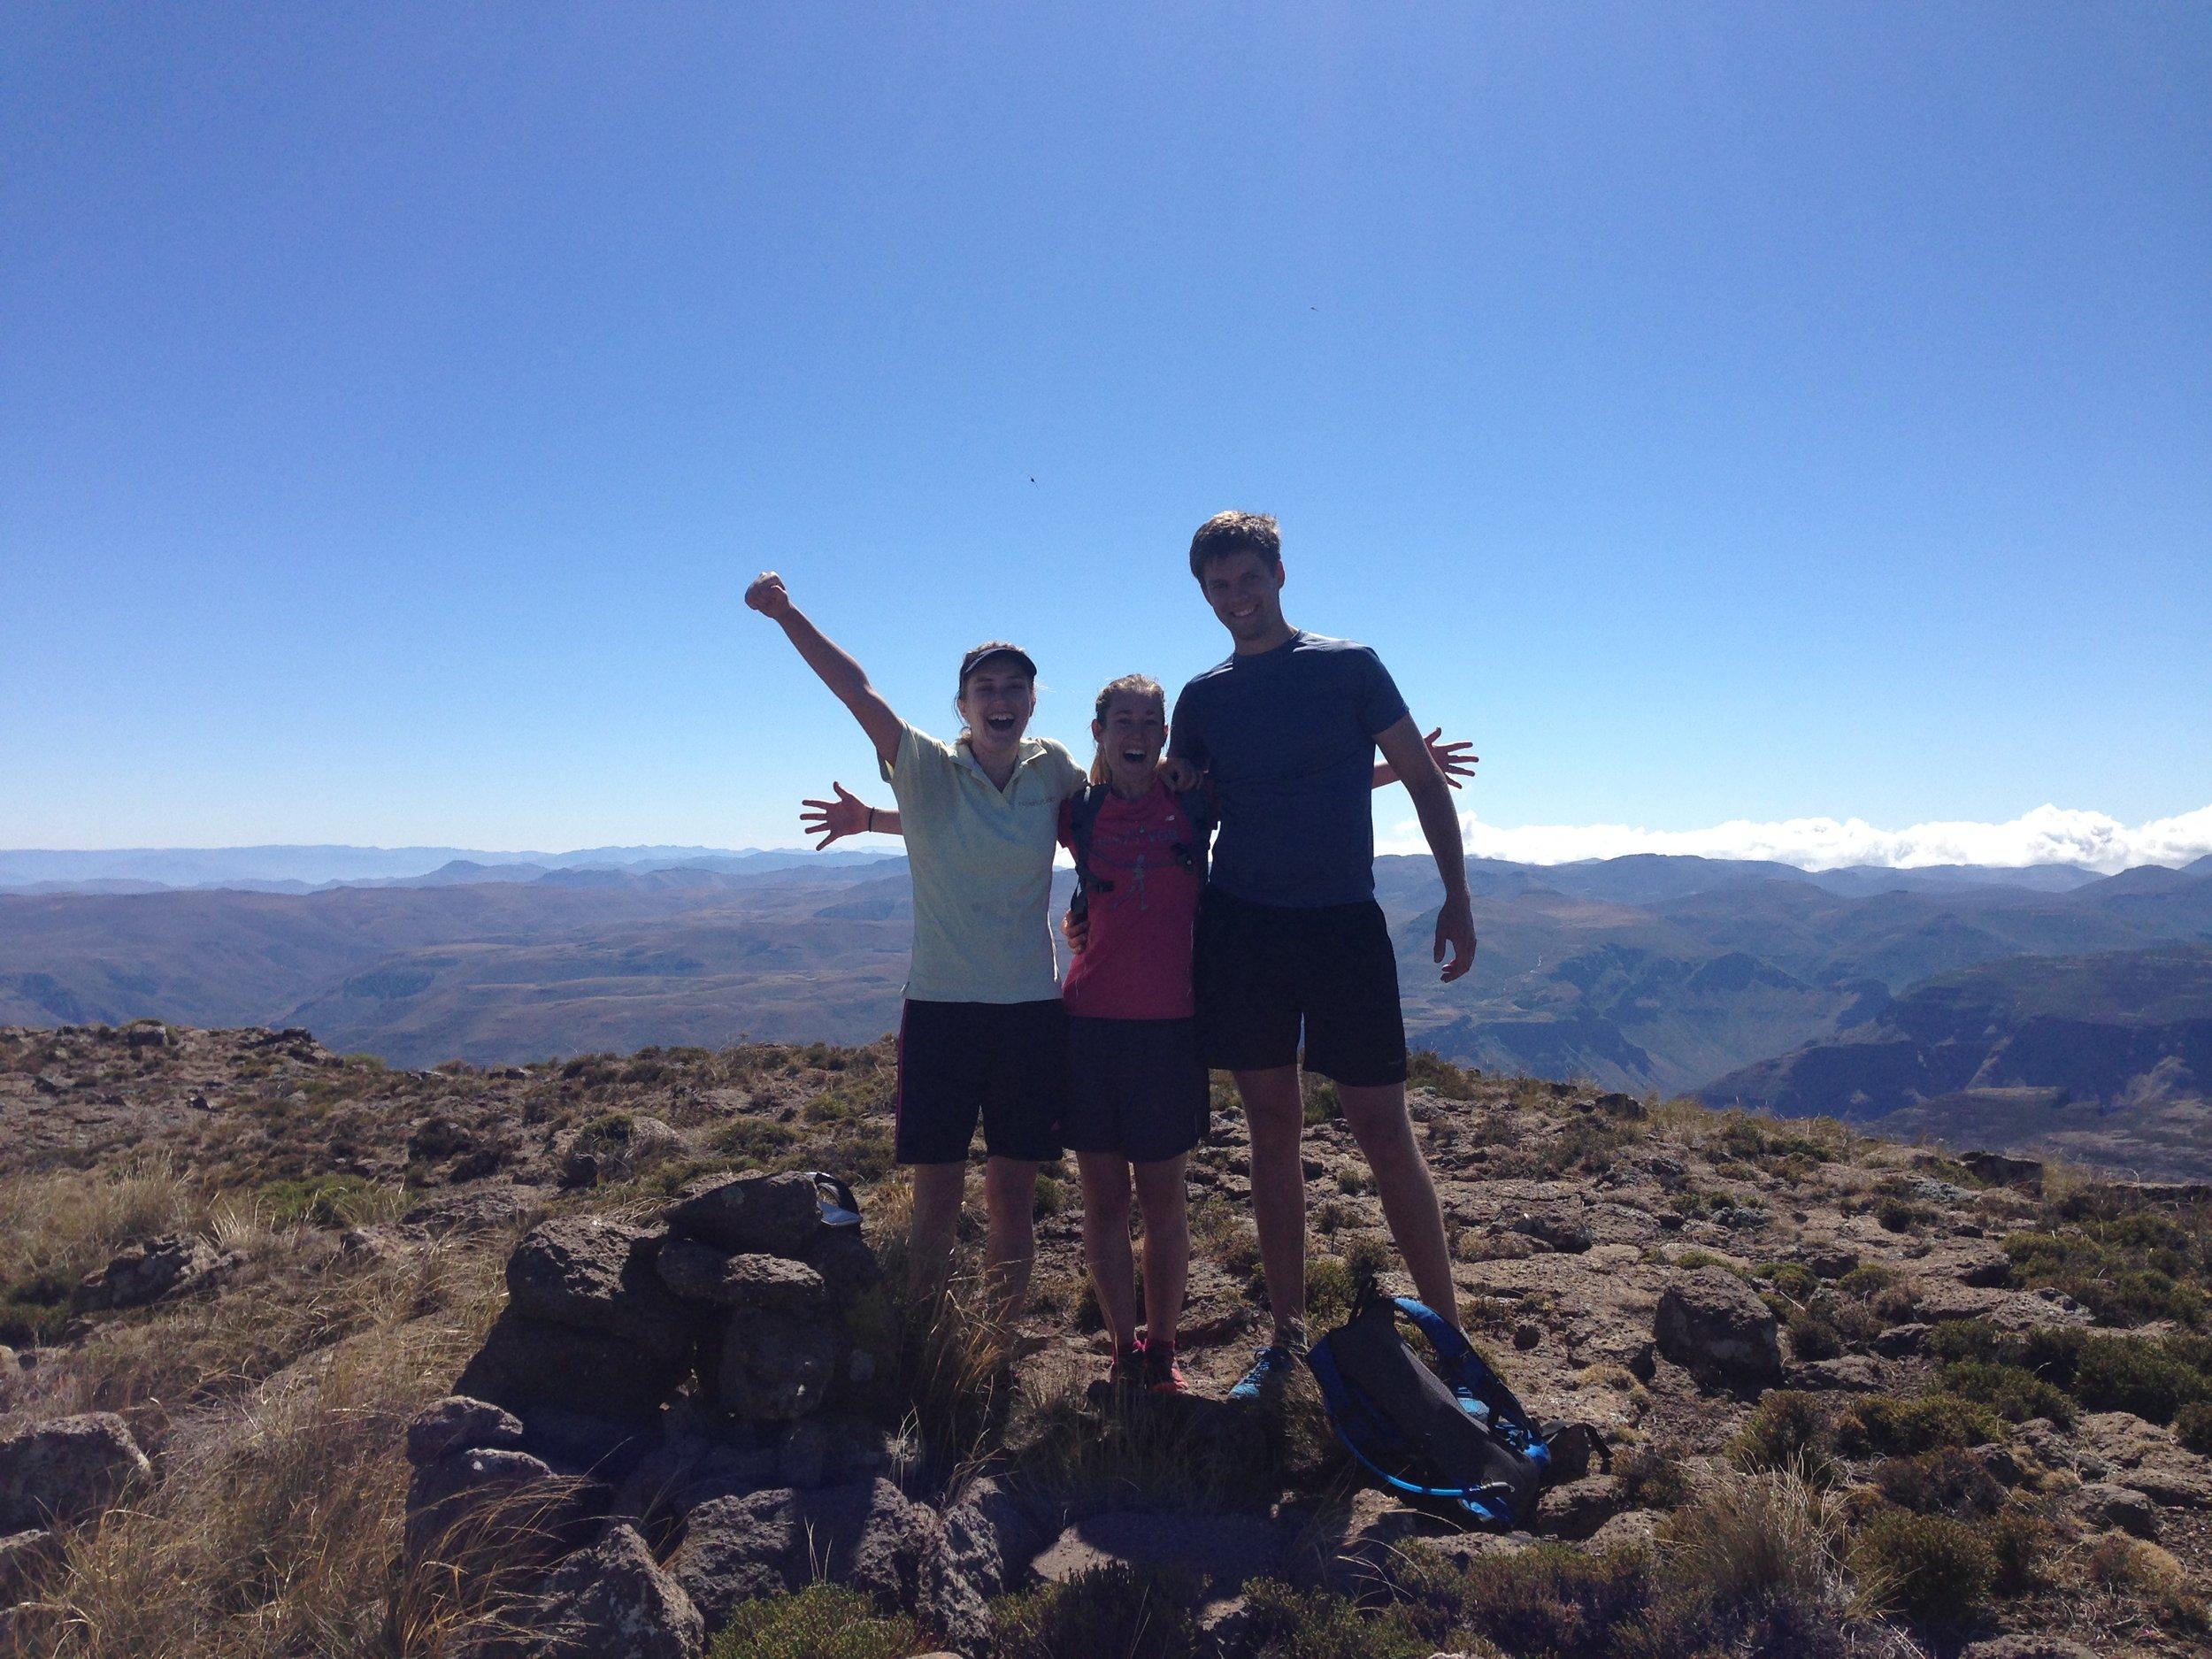 Caro, Tarryn and Morgan on the summit of Thaba Putsoa